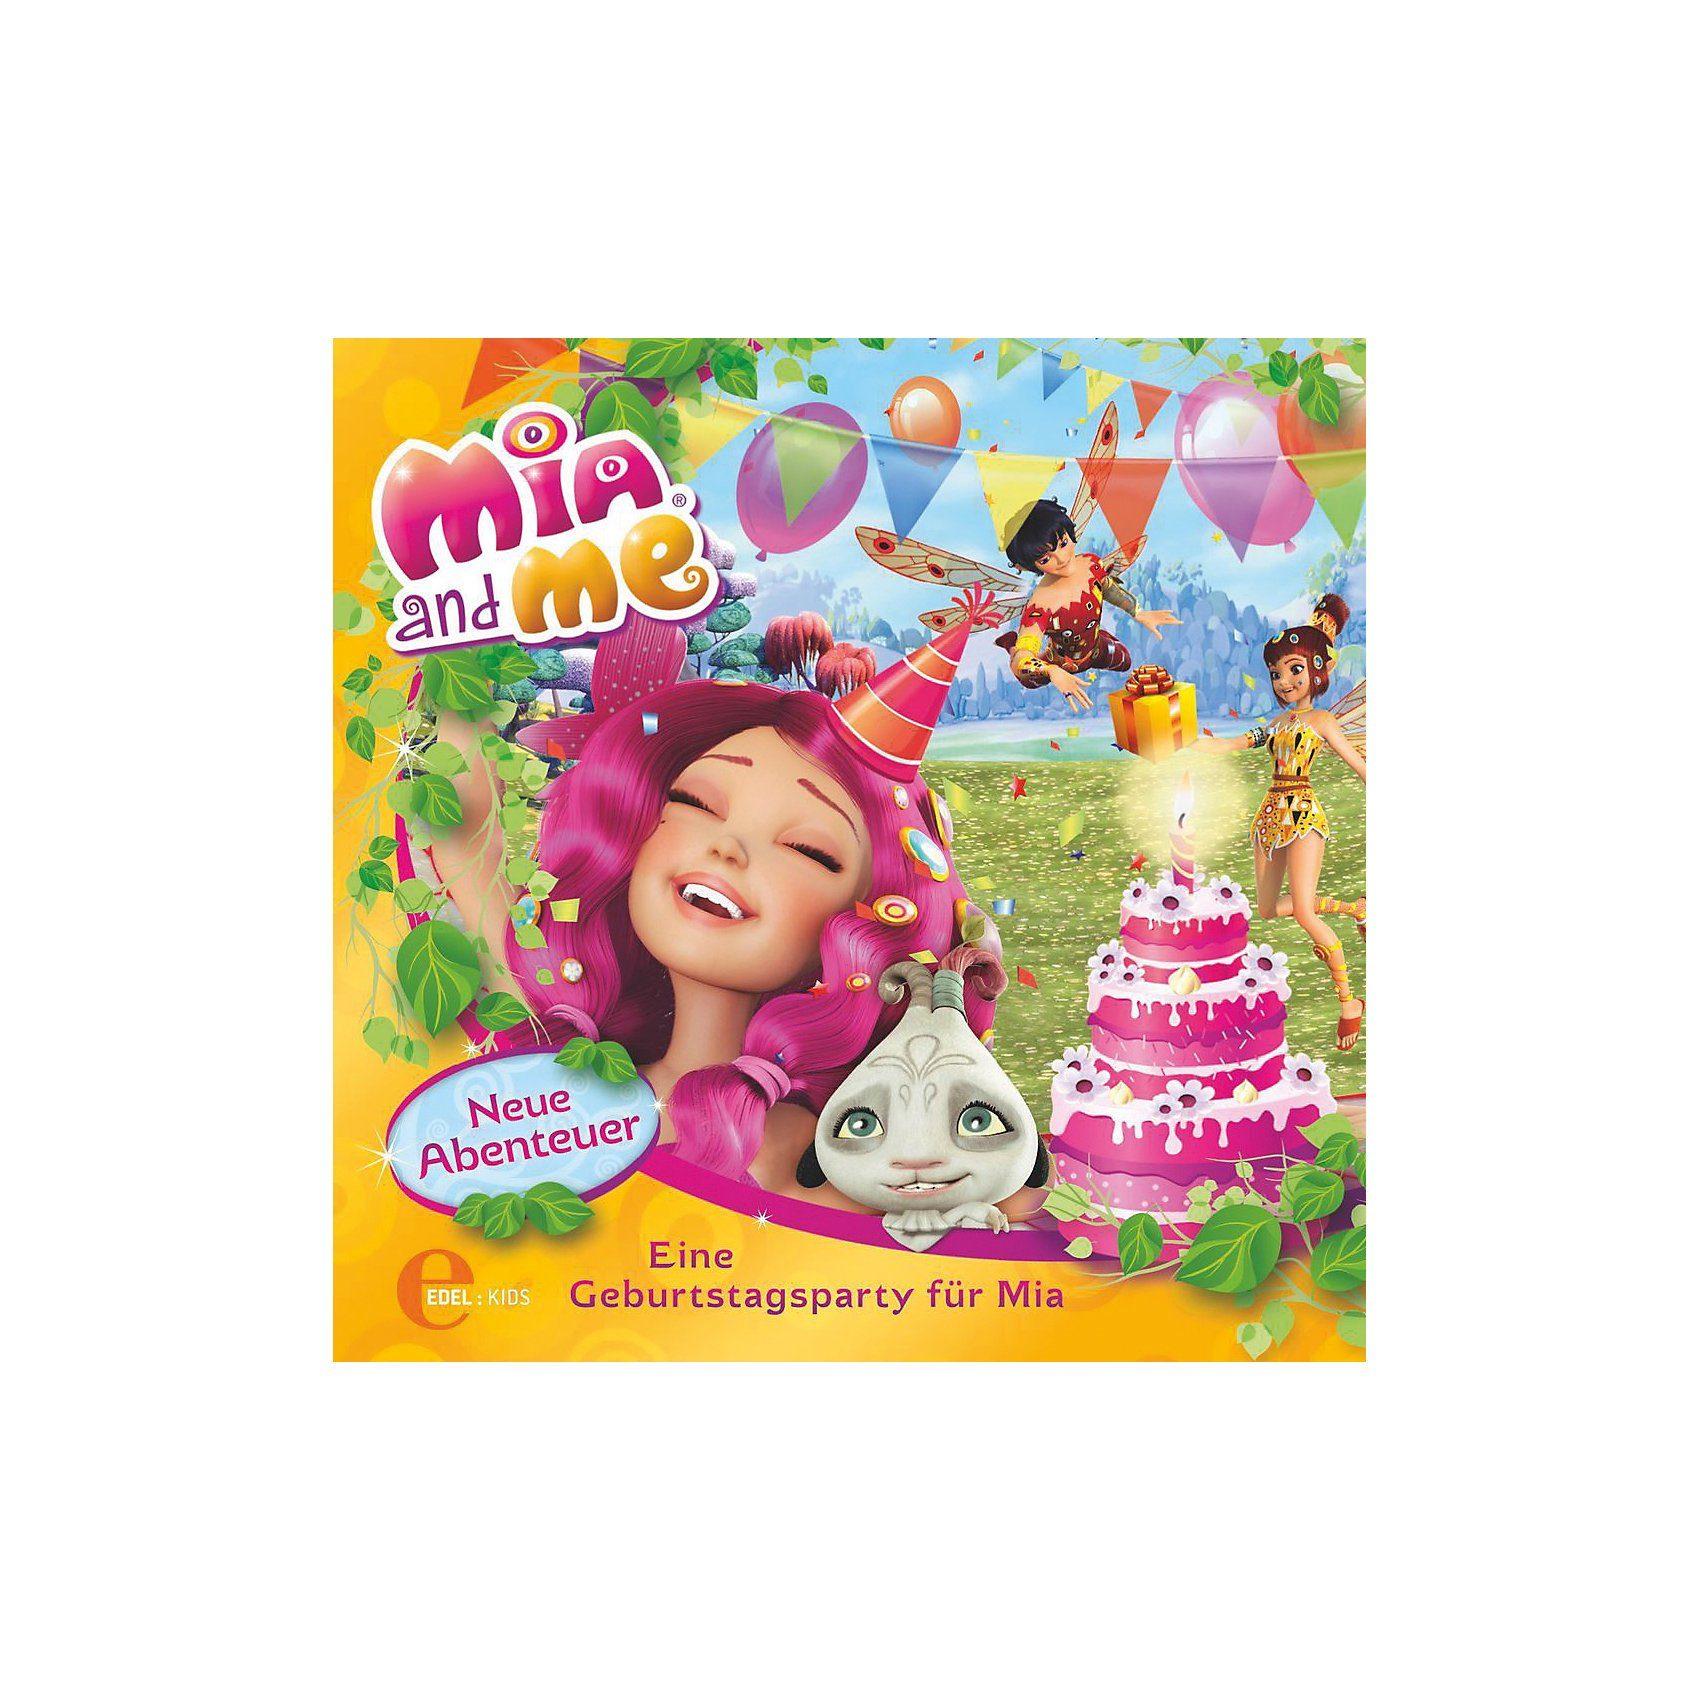 Edel CD Mia and Me 03 - Eine Geburtstagsparty für Mia